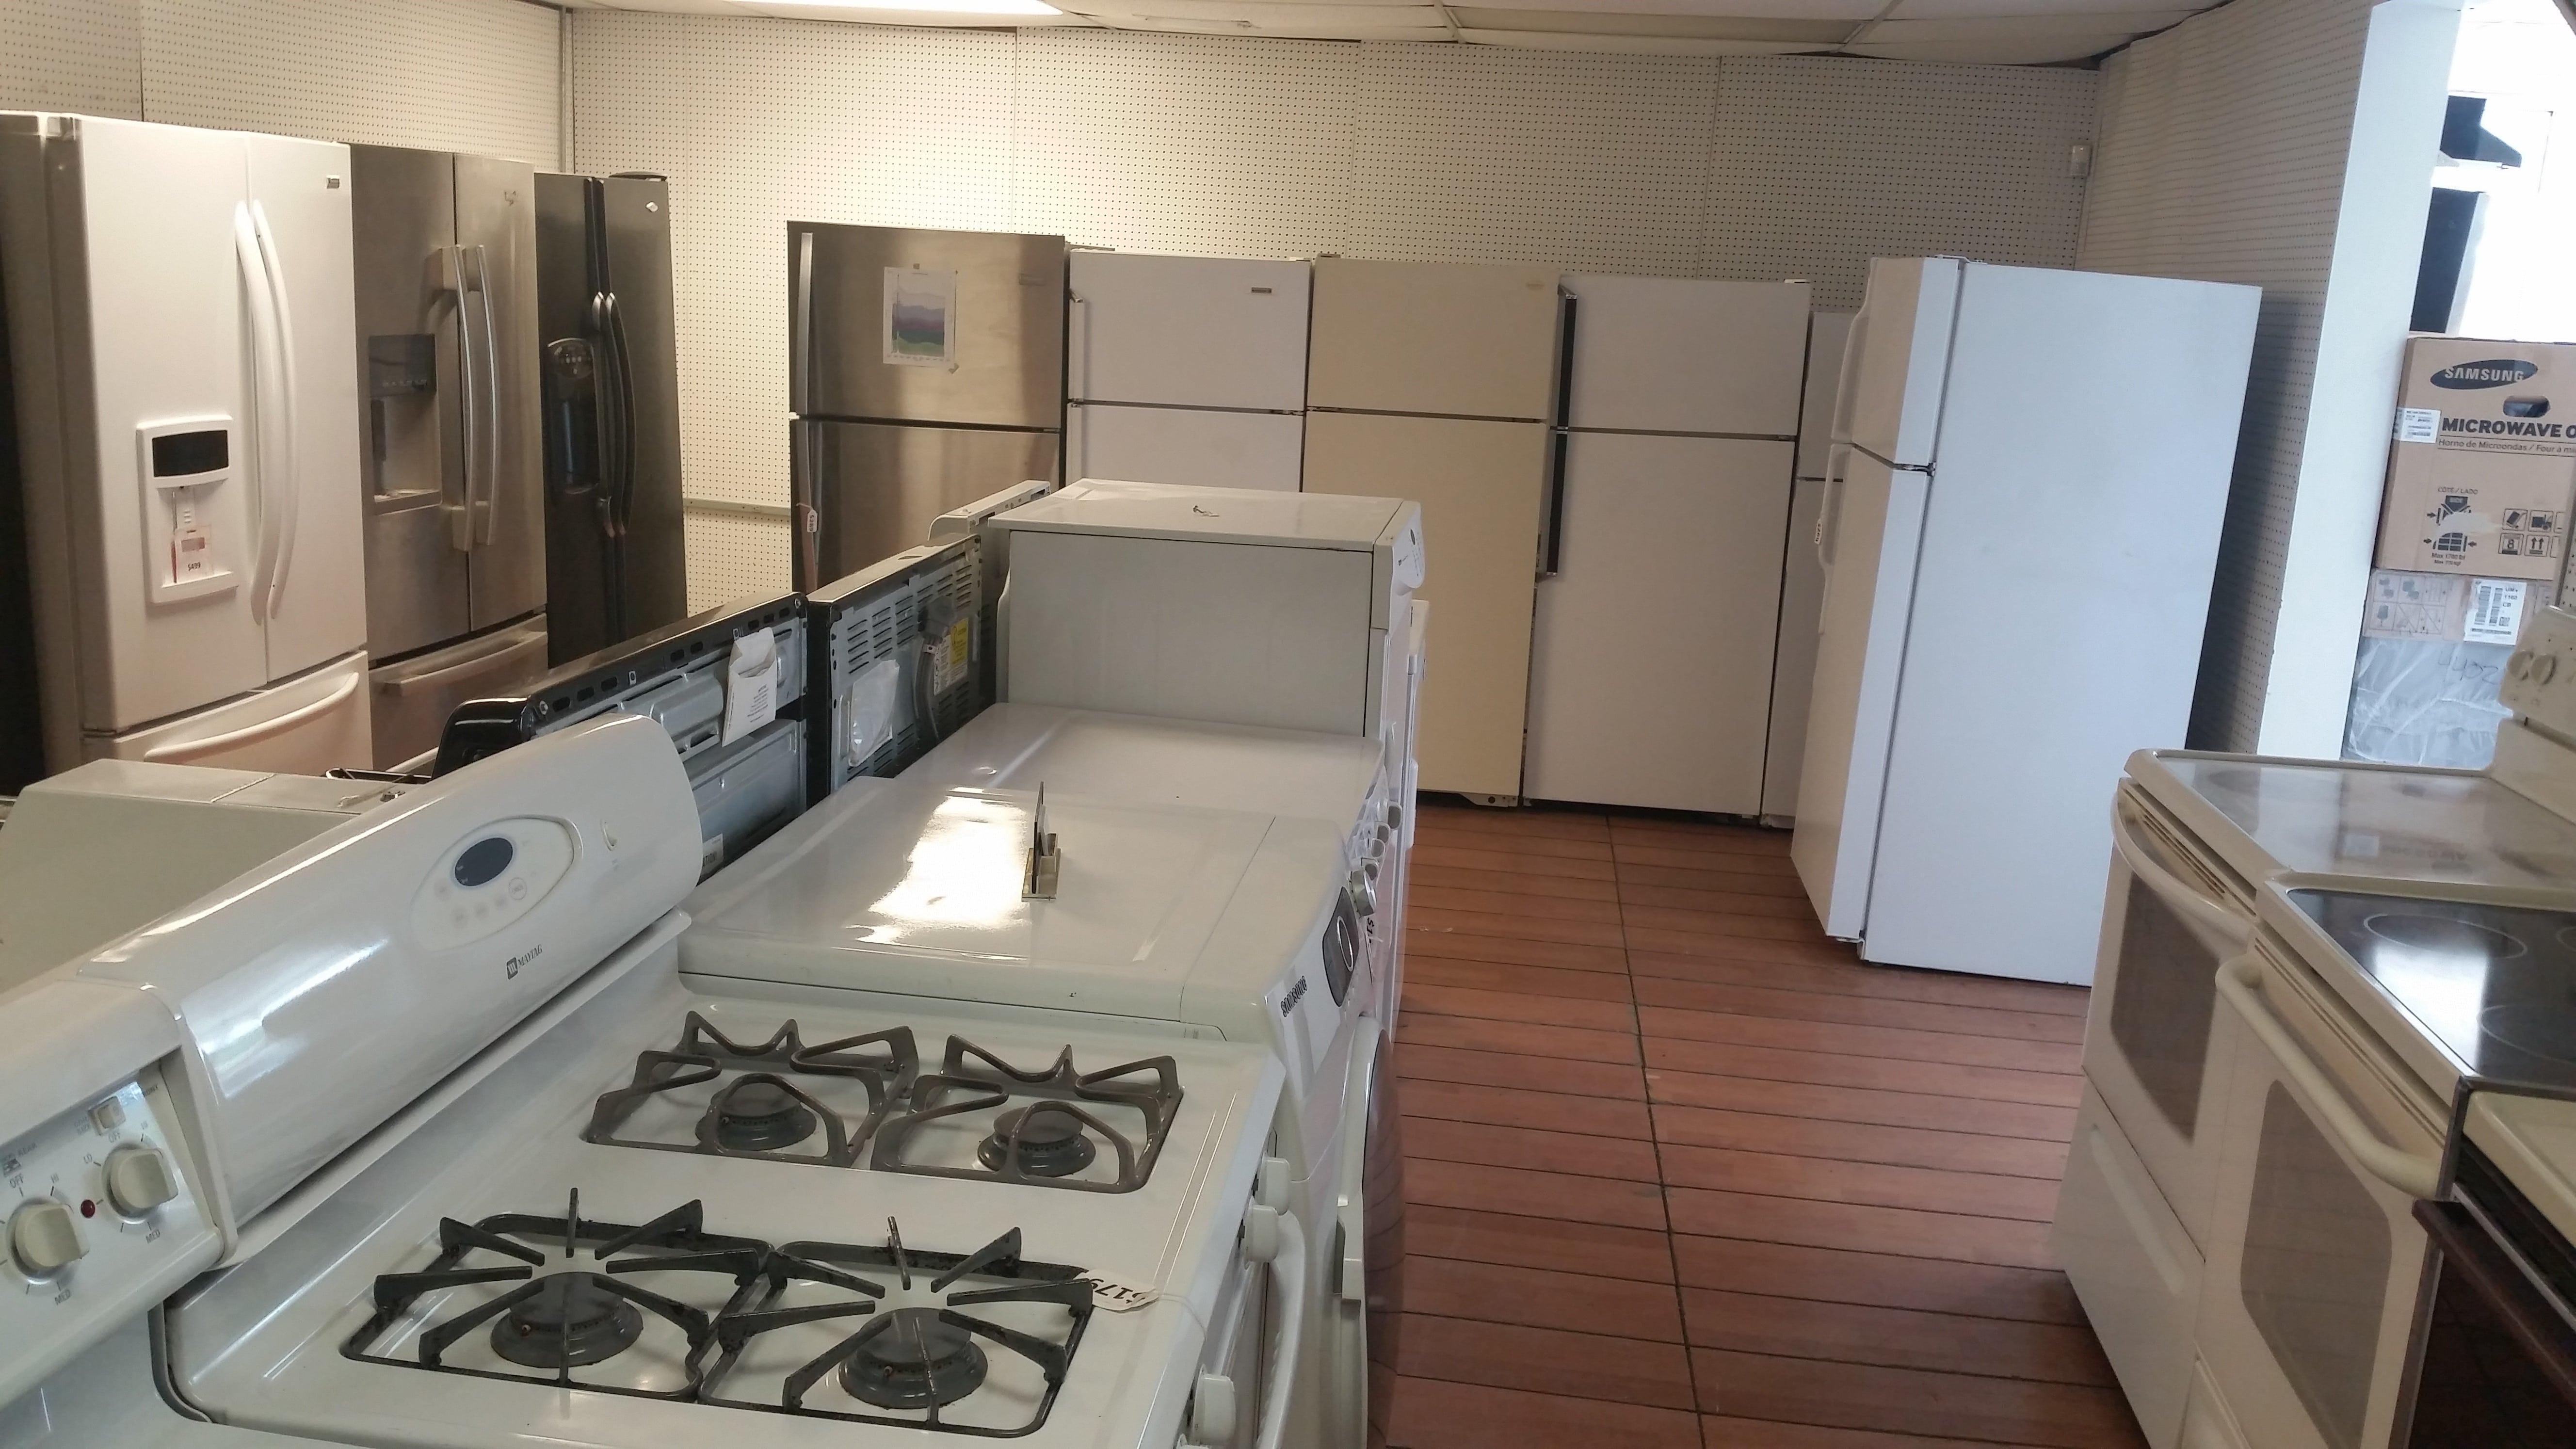 McFarlane's Appliance Center